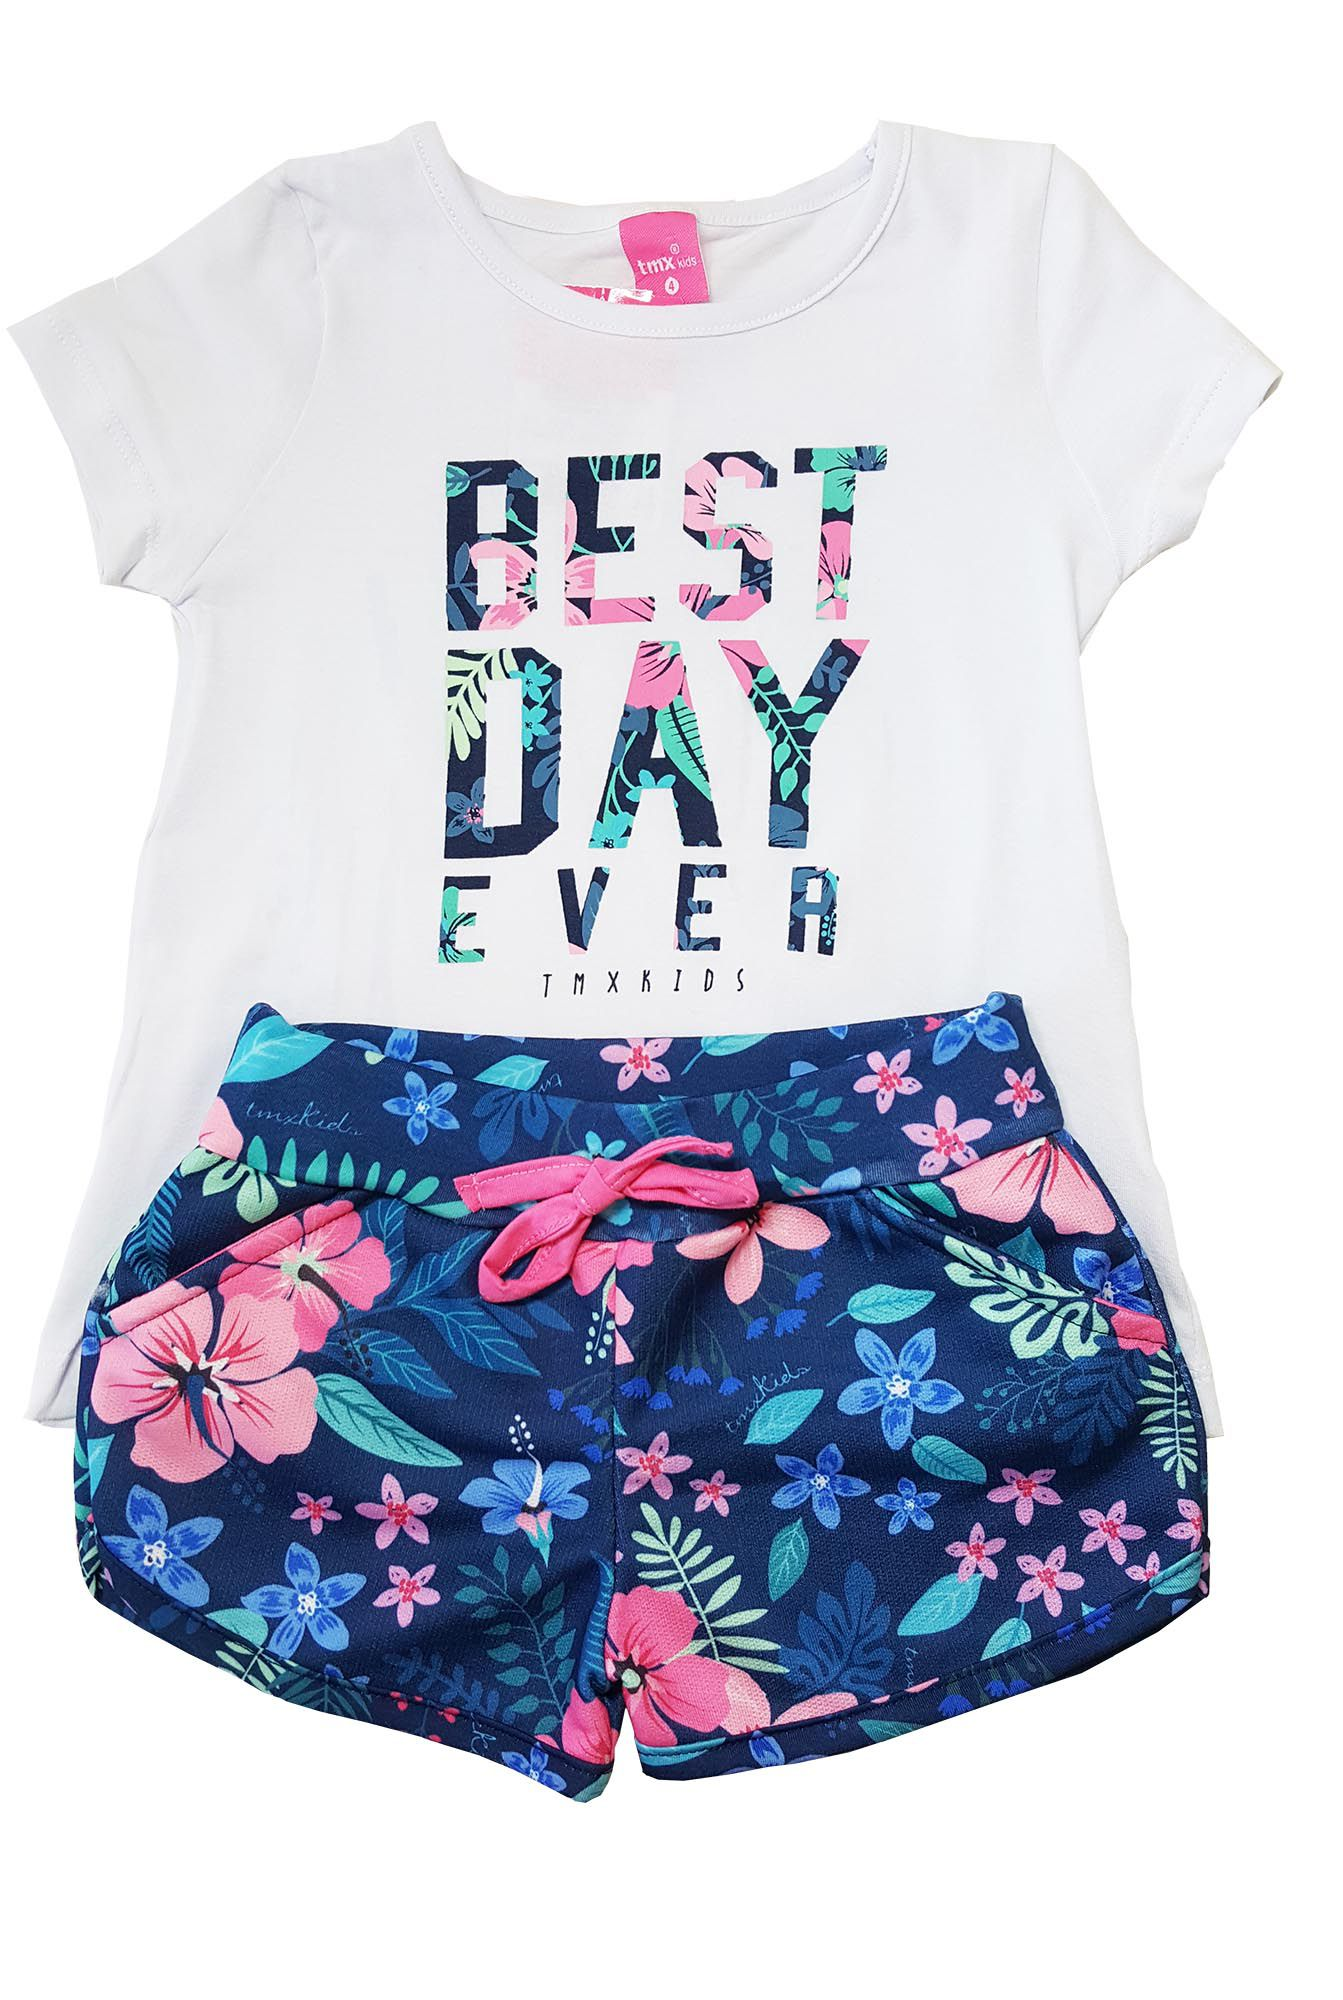 Conjunto Blusa e Shorts TMX  Best Day Branco/Marinho